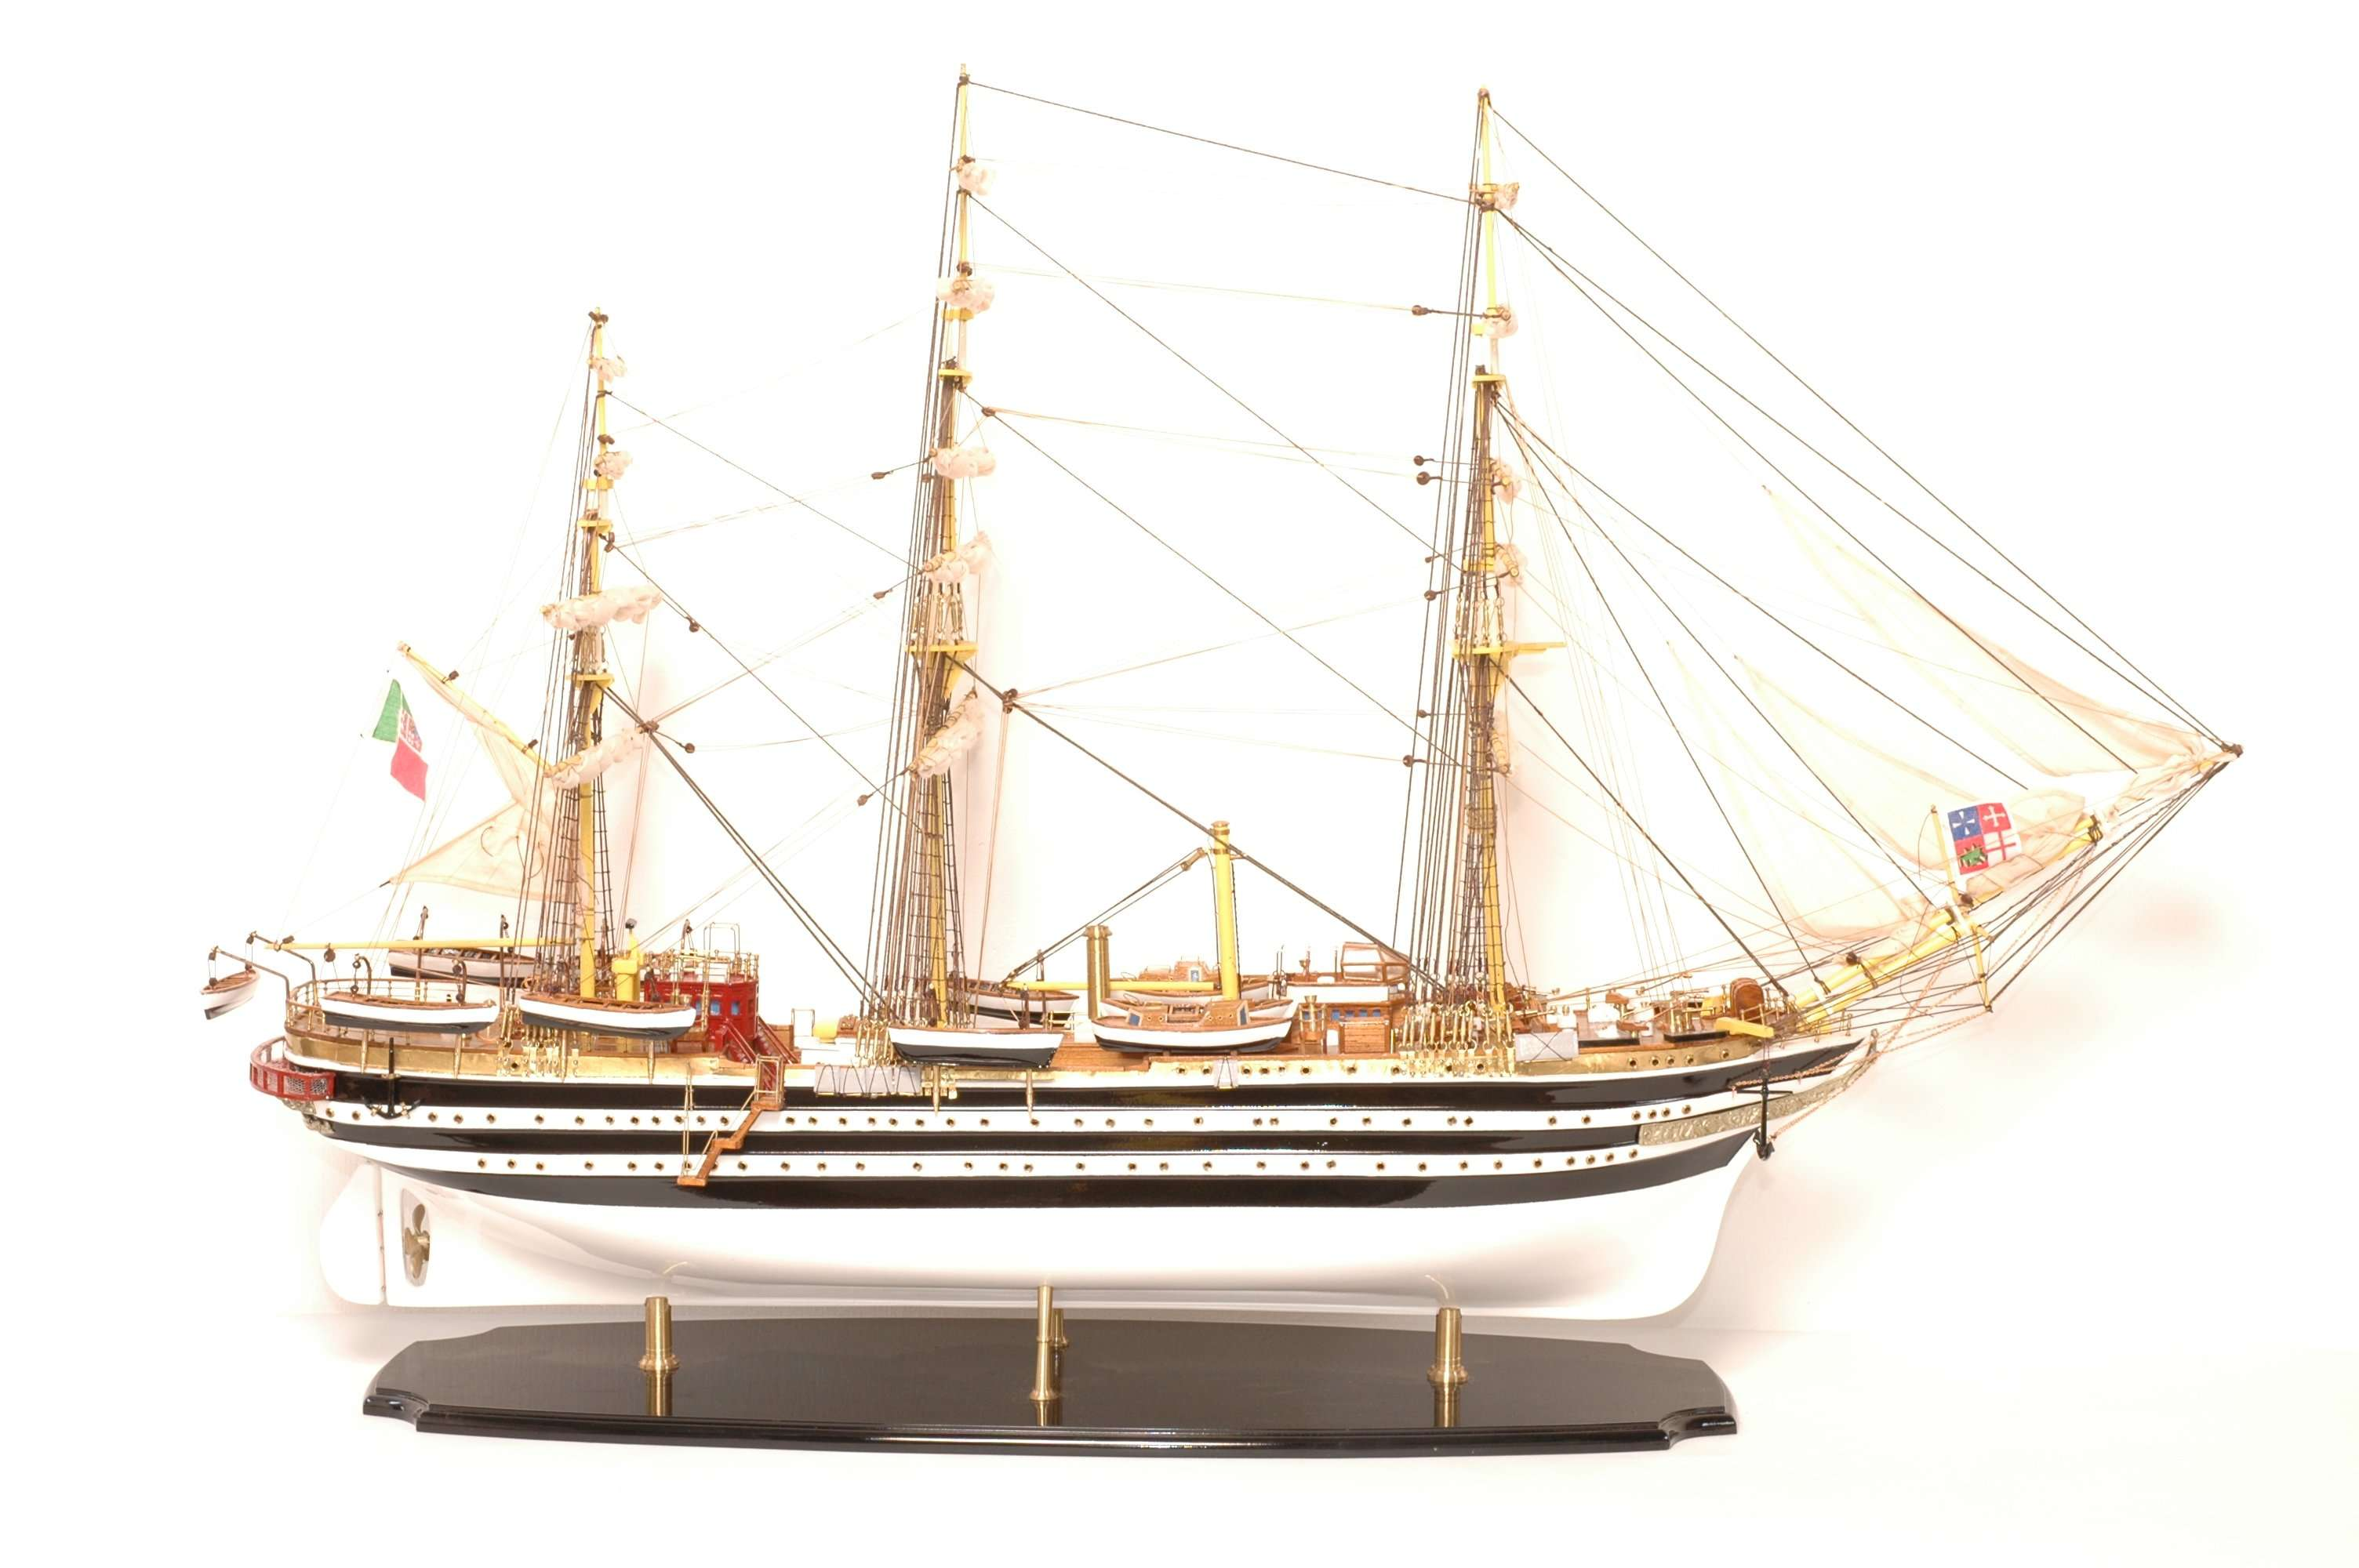 498-4219-Amerigo-Vespucci-Model-Ship-Superior-Range